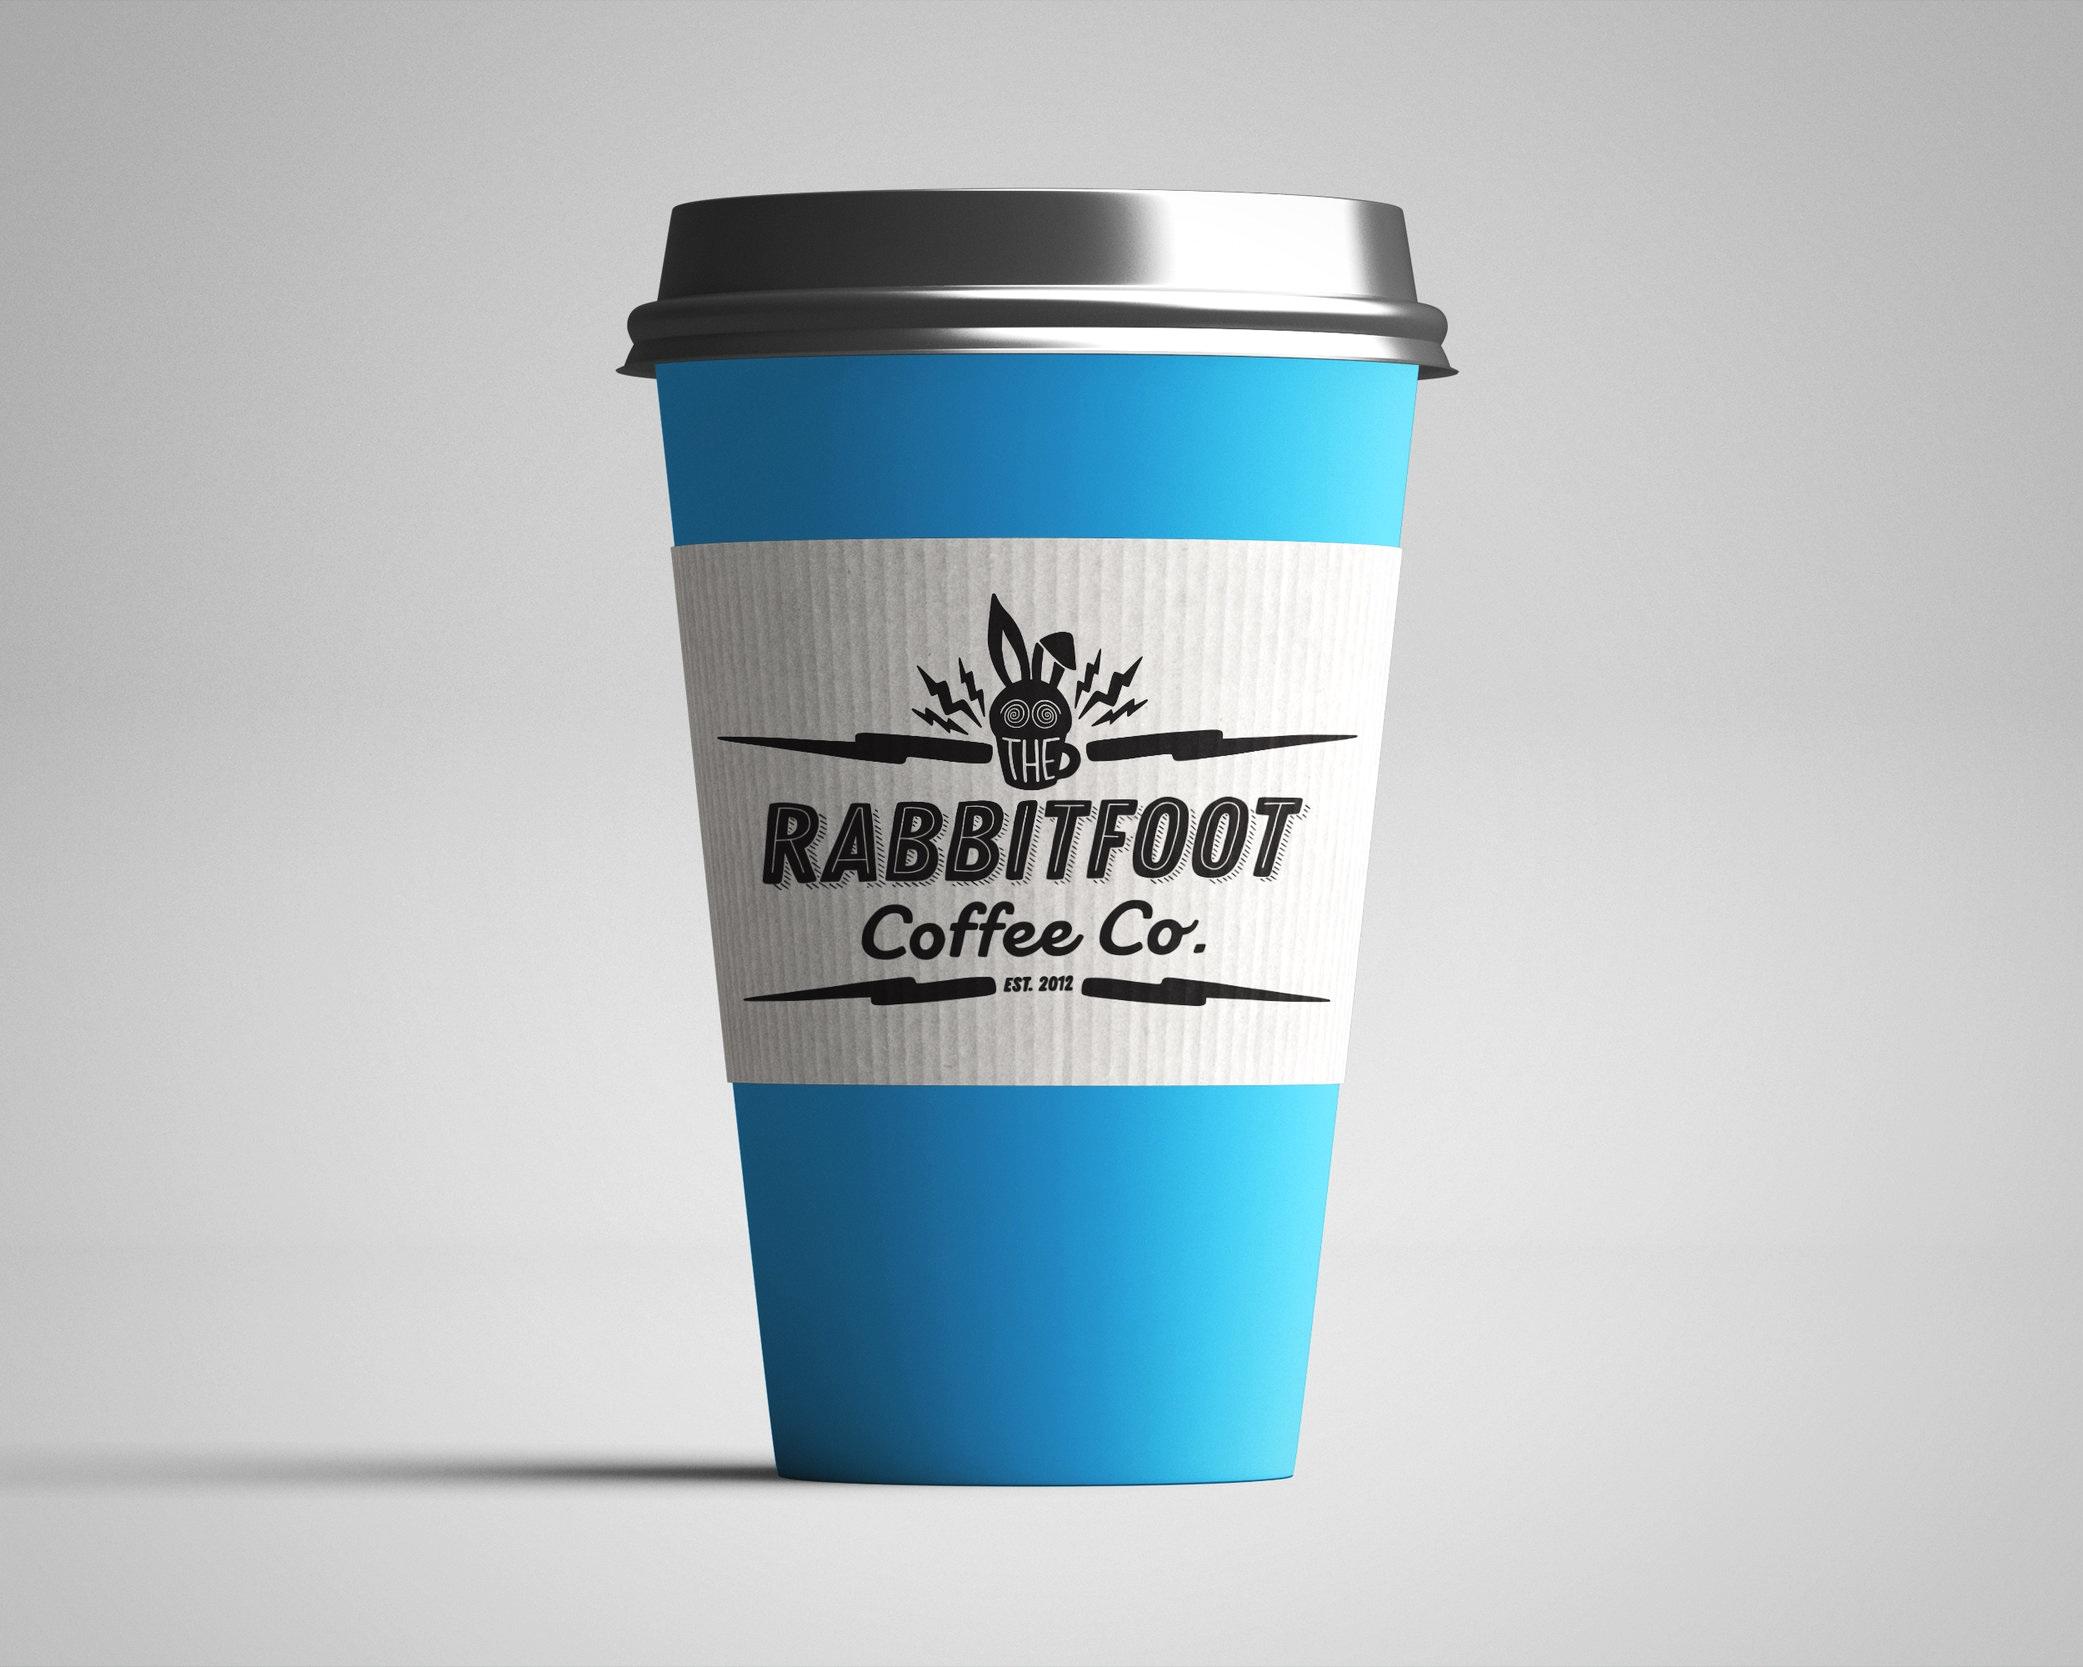 coffee_mockup_rabbitfoot.jpg